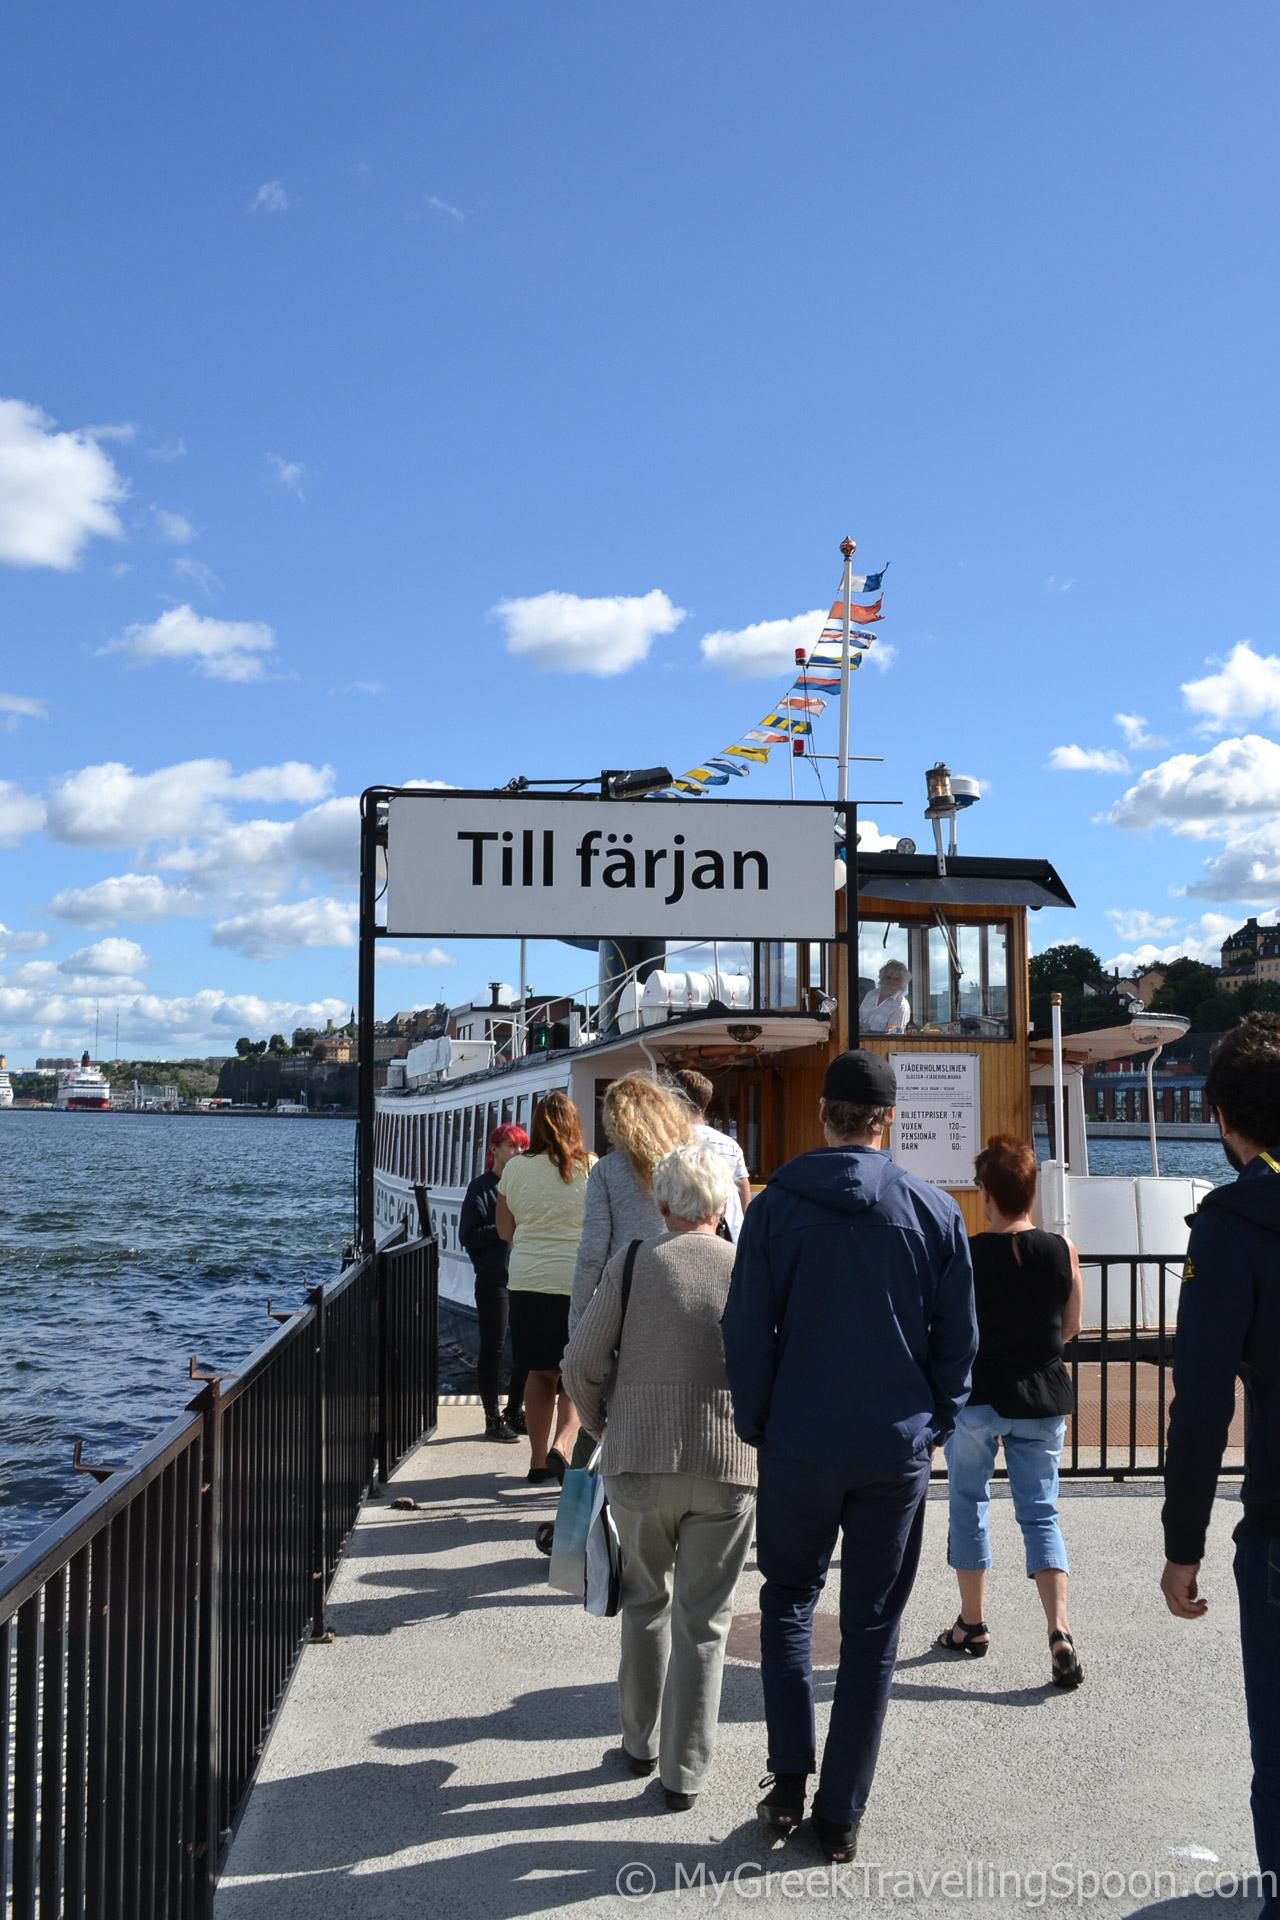 Fjäderholmarna islands are just half an hour boat trip away.